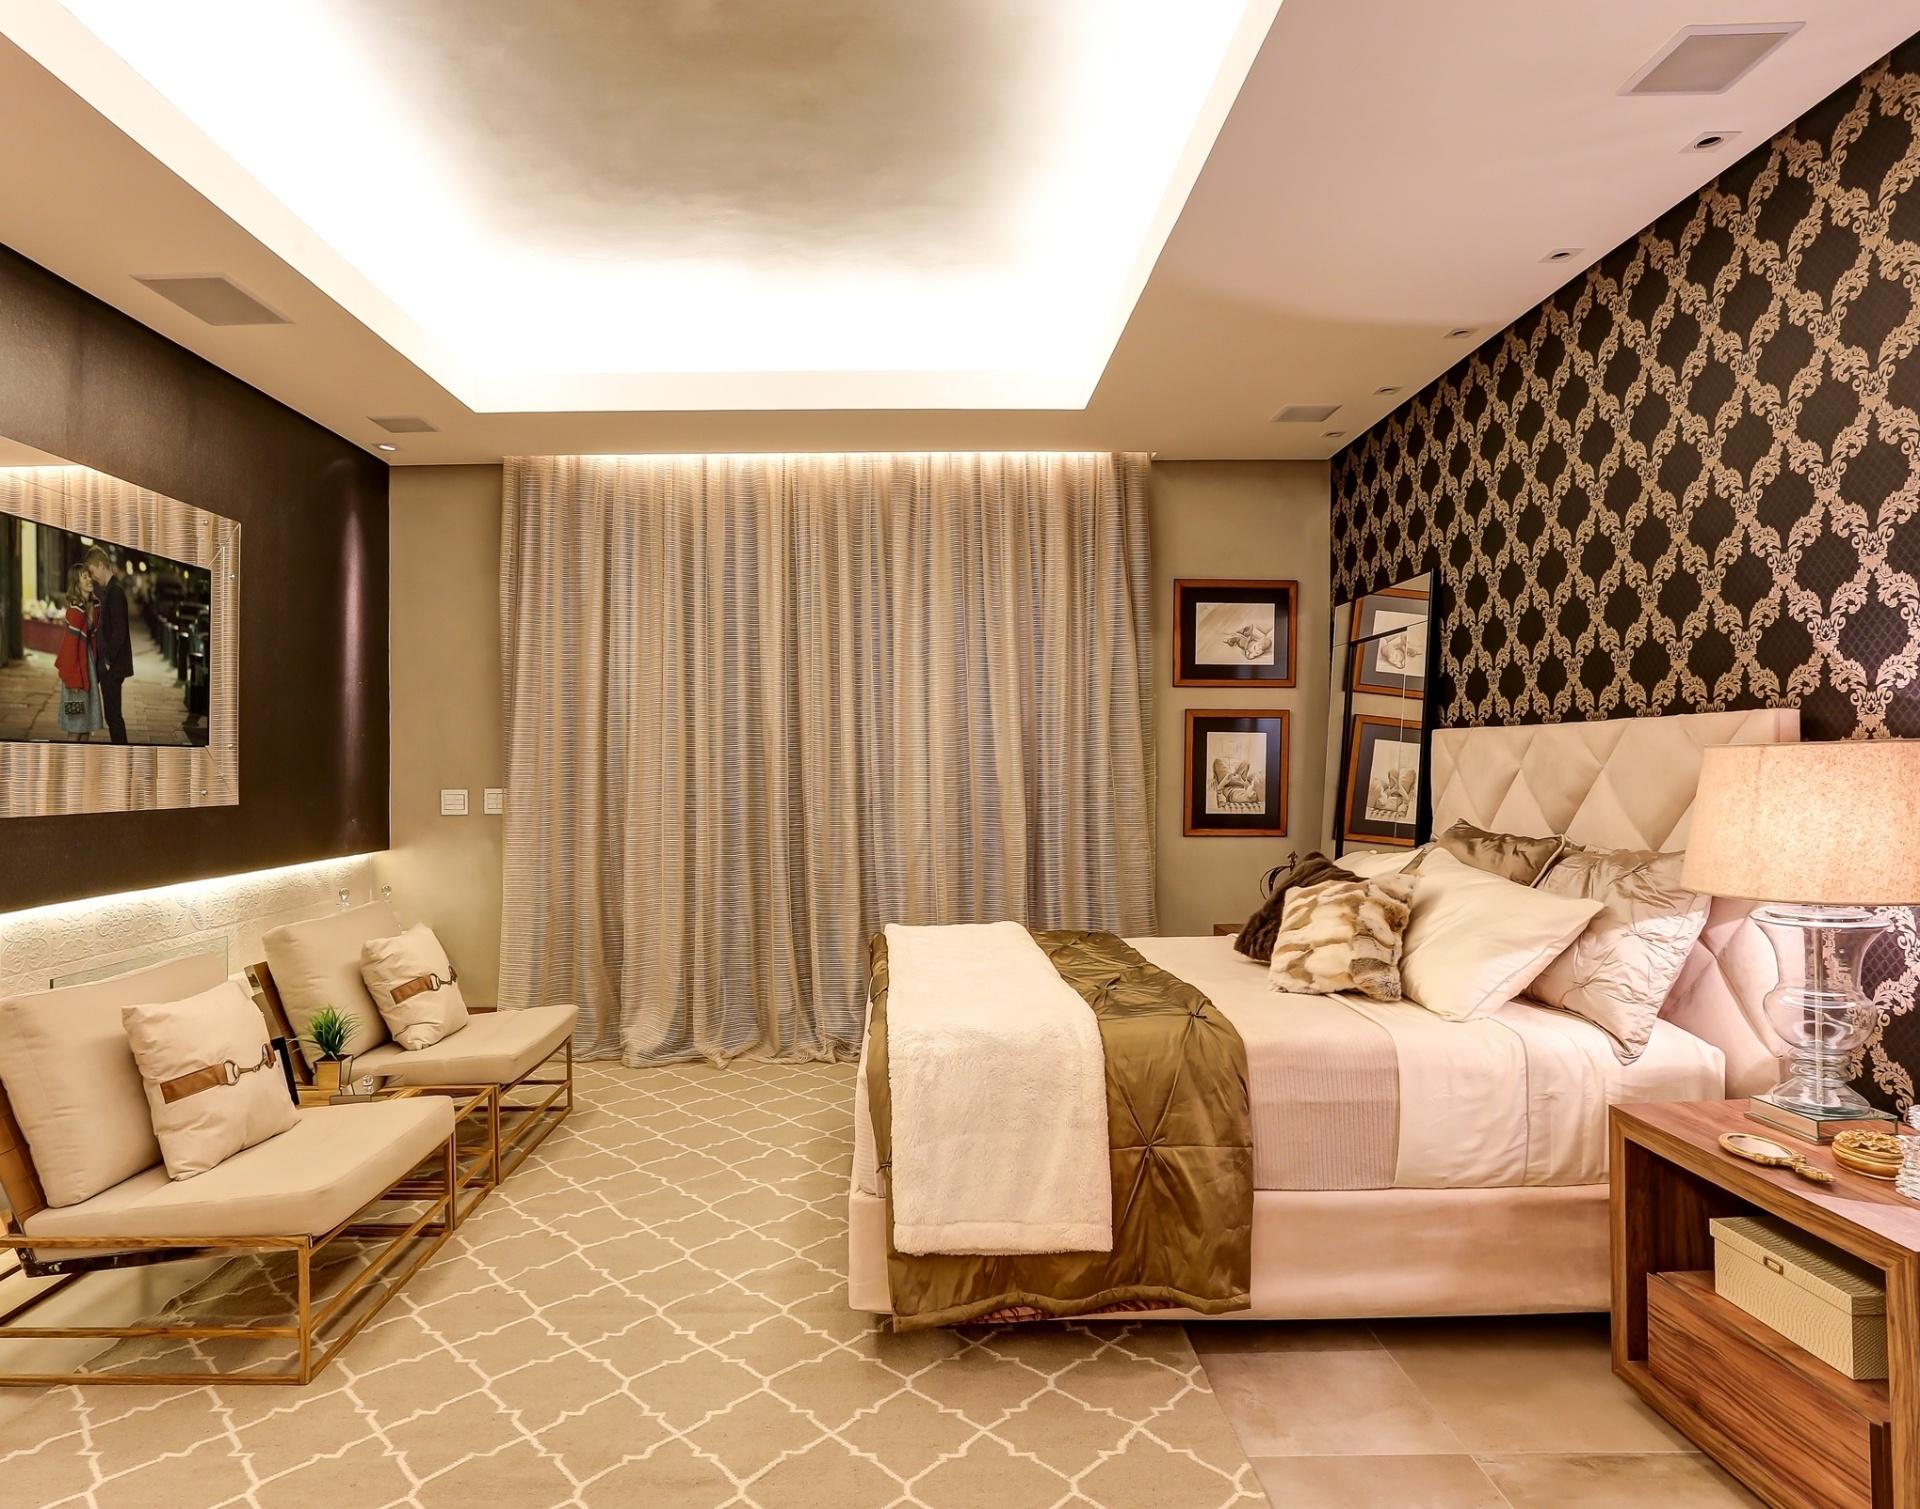 Design casa consulting brics page 2 for Case con 2 master suite